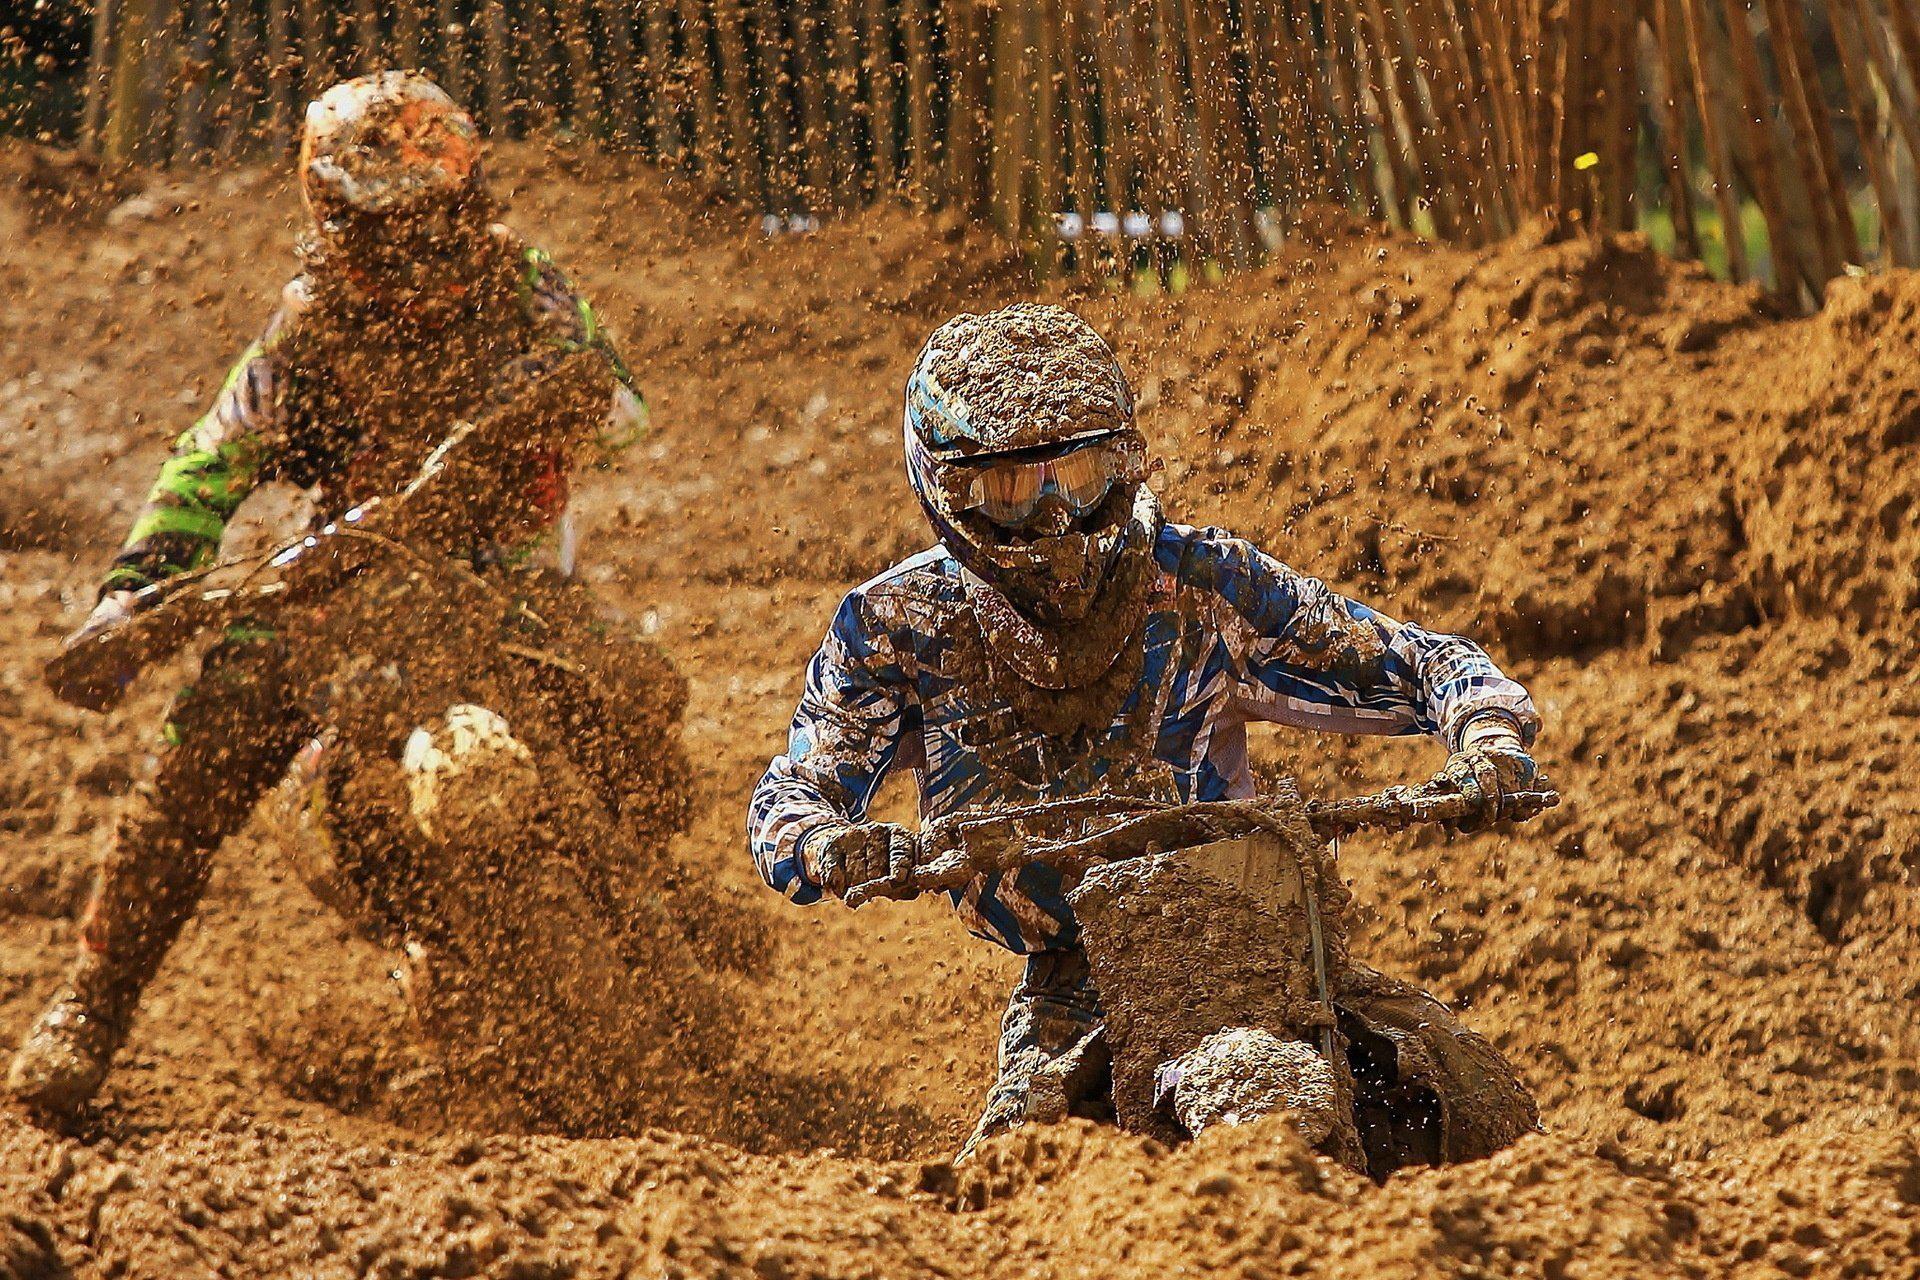 Race Motorcycle Sports Racing Dirtbike Motocross